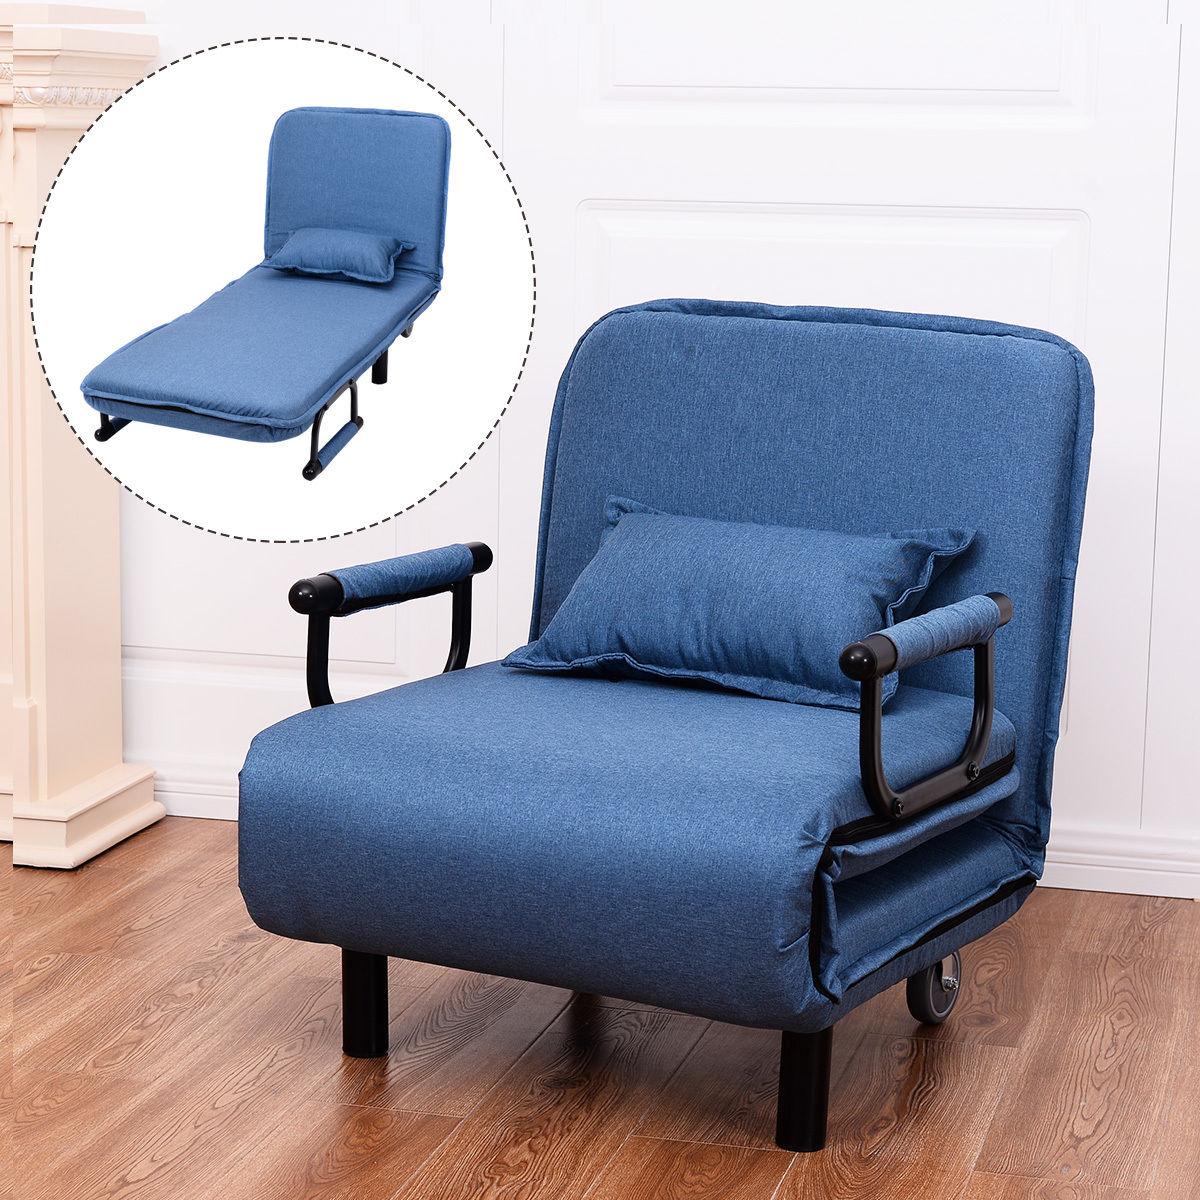 Giantex Convertible Sofa Bed Modern Folding Arm Chair ...